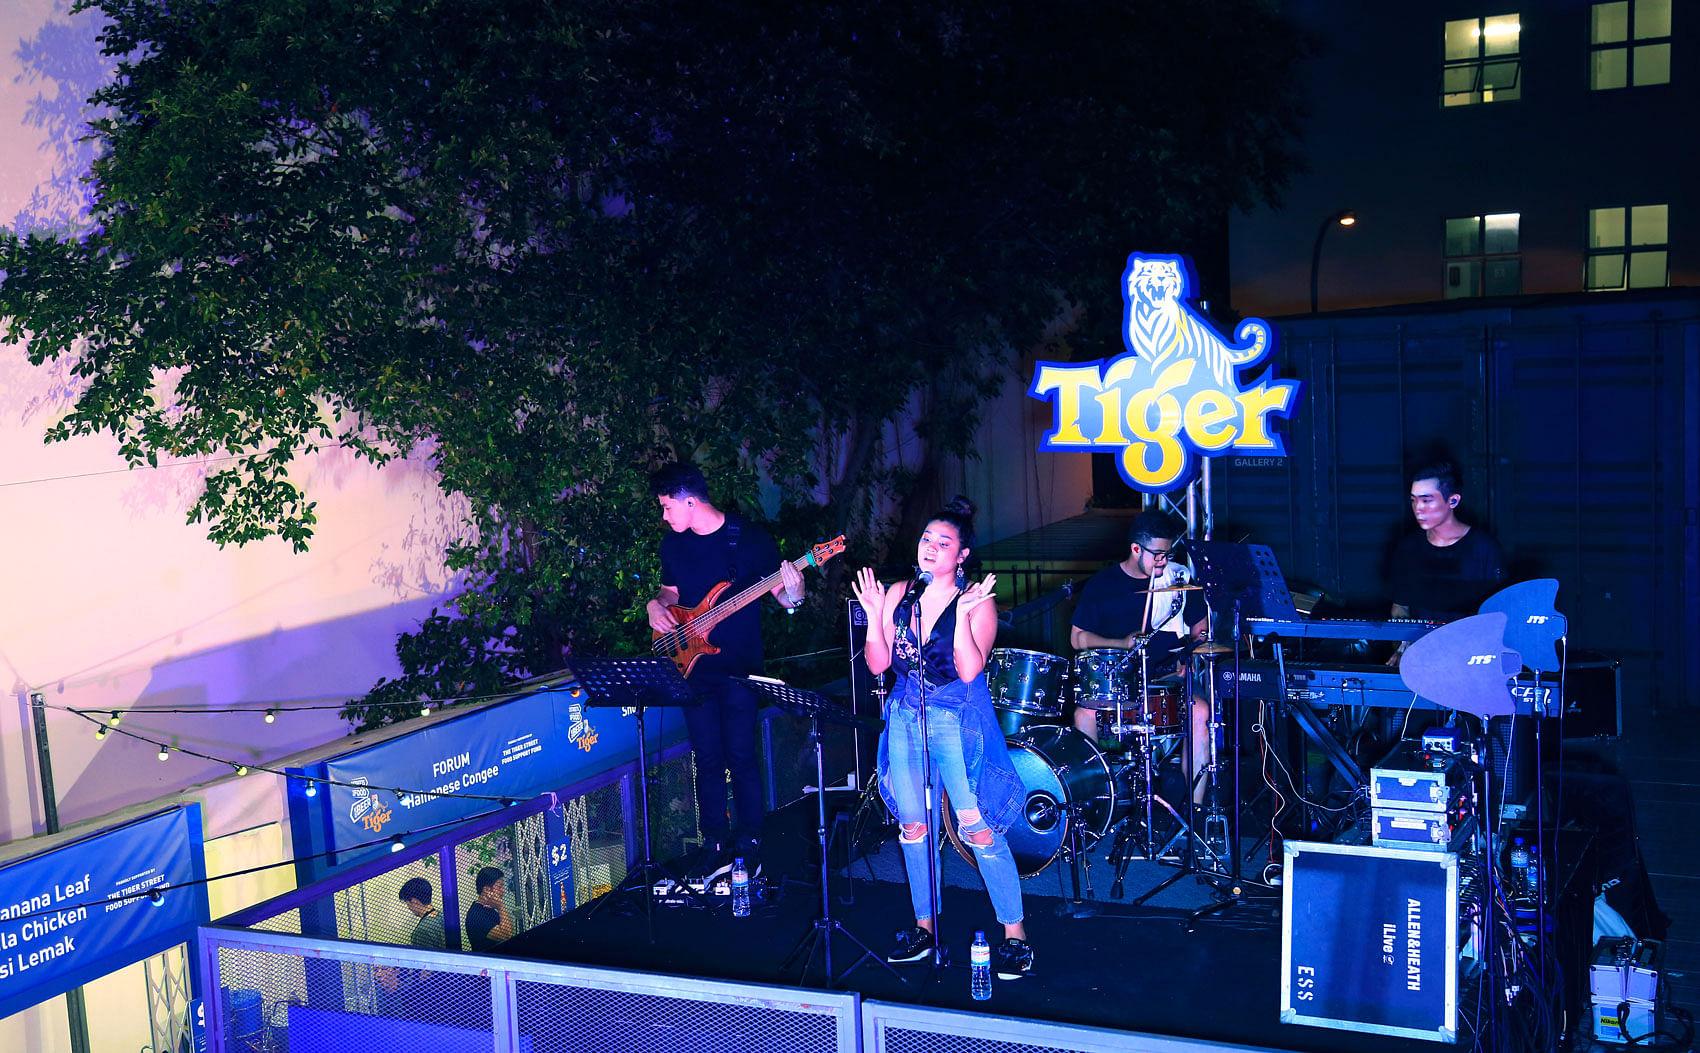 Local crooner Gail Belmonte at the Tiger Street Food Pop-up